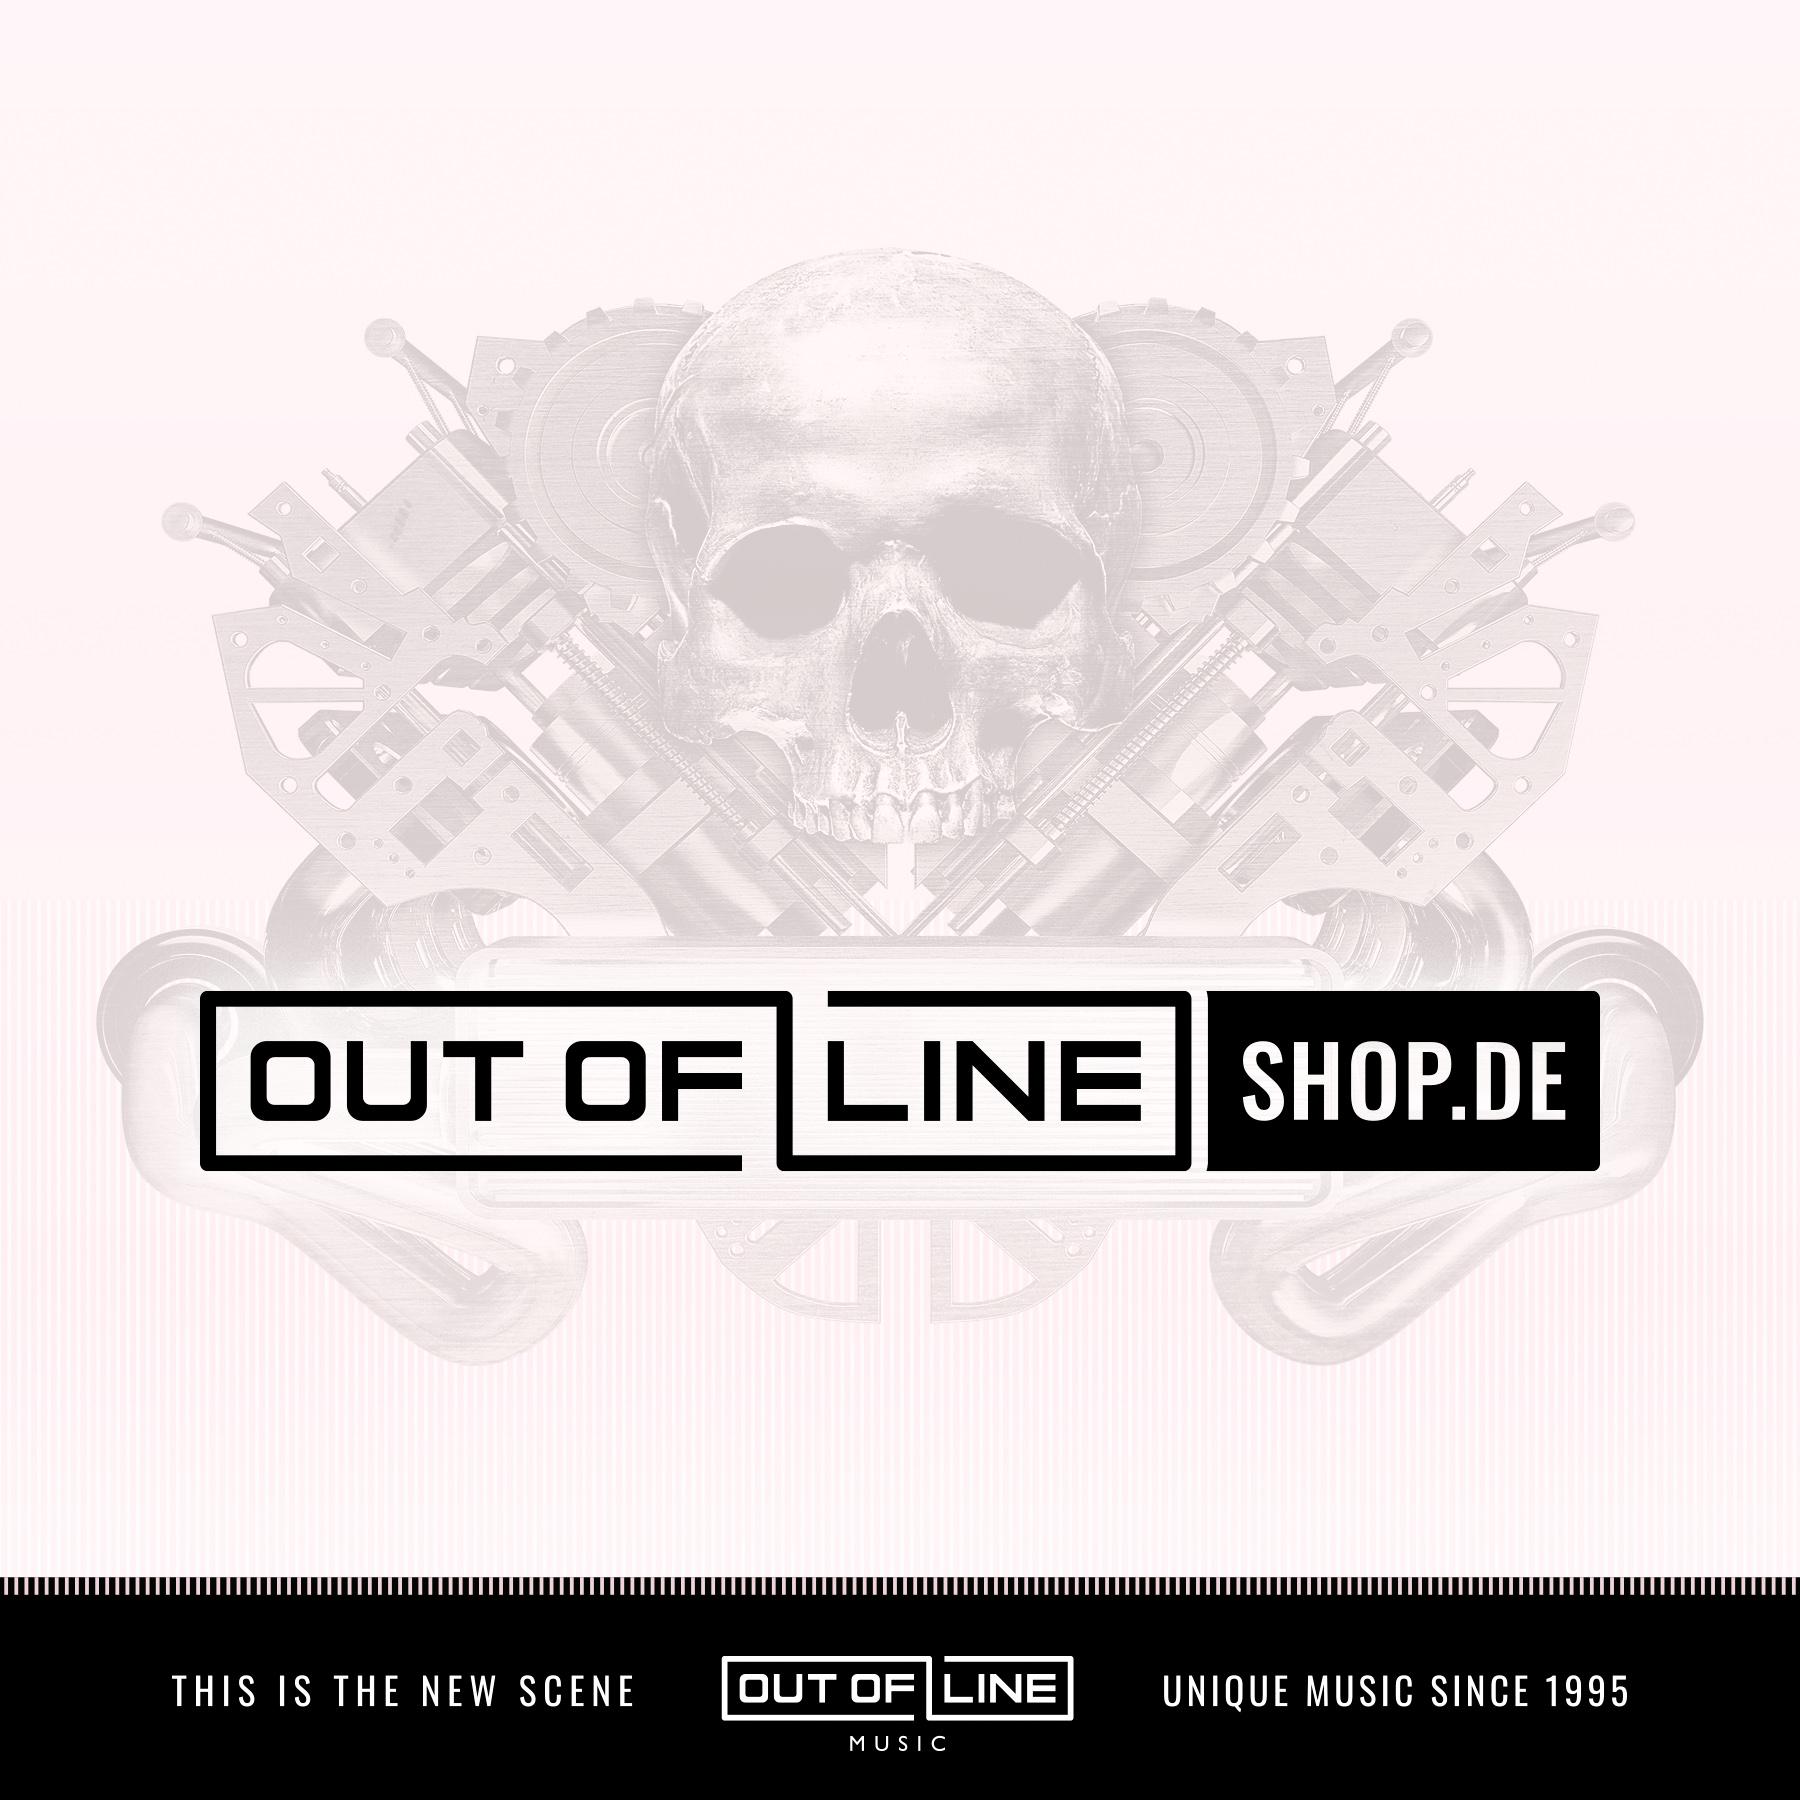 V.A. - B52 Remixes (Mildreda - Psy'Aviah - Llumen) - CD EP